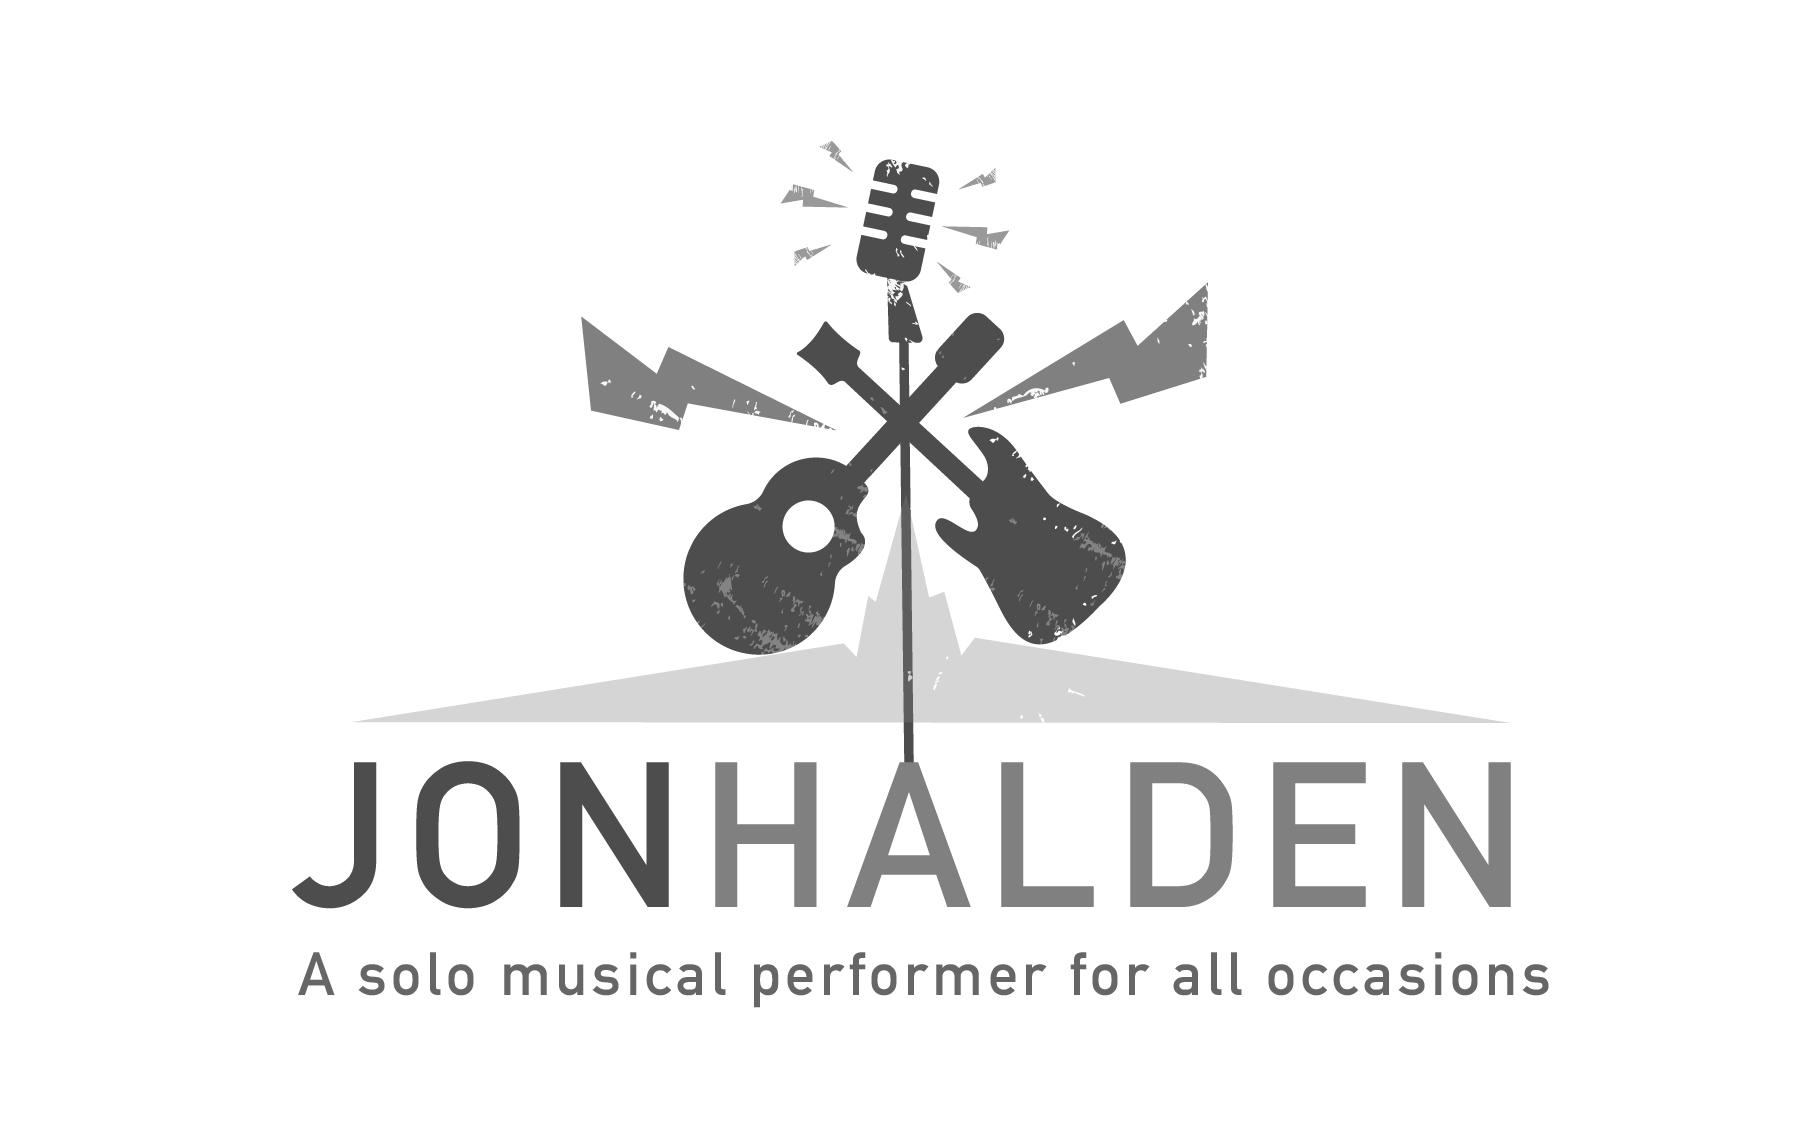 Jon Halden